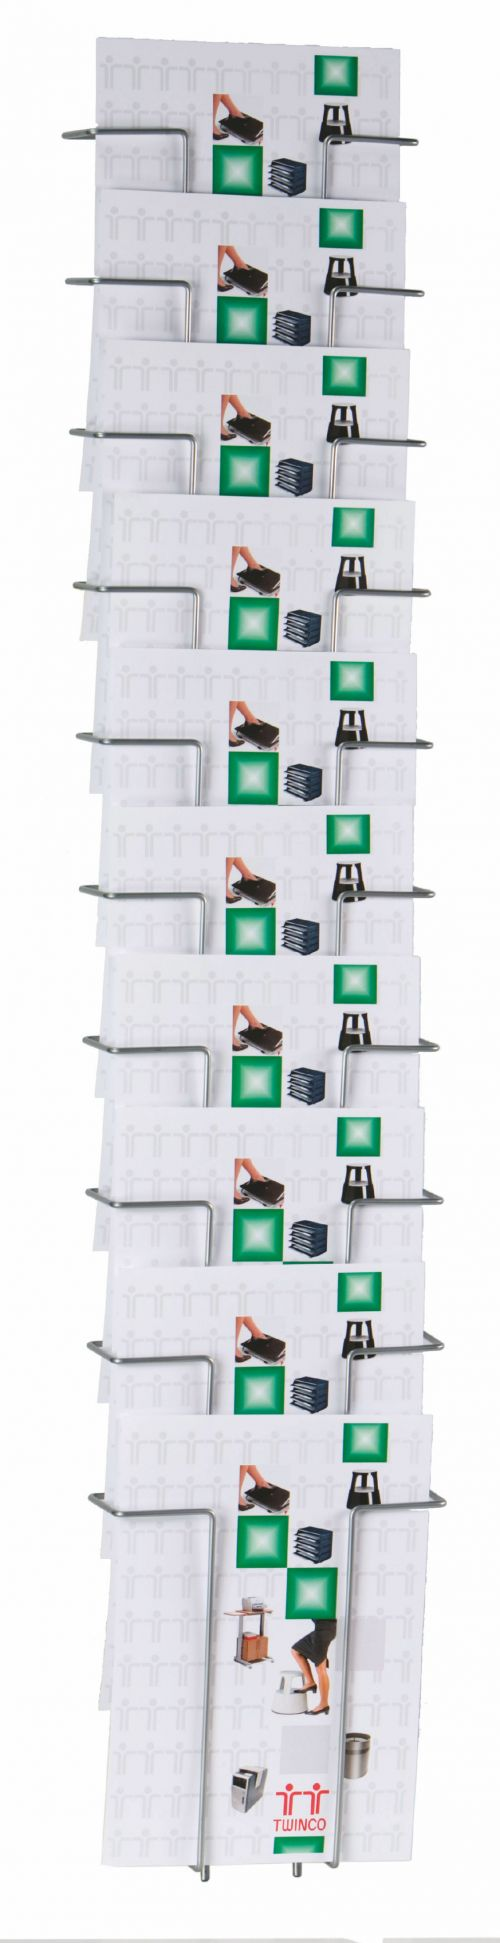 Twinco Wall Literature Holder A4 10 Compartments Silver